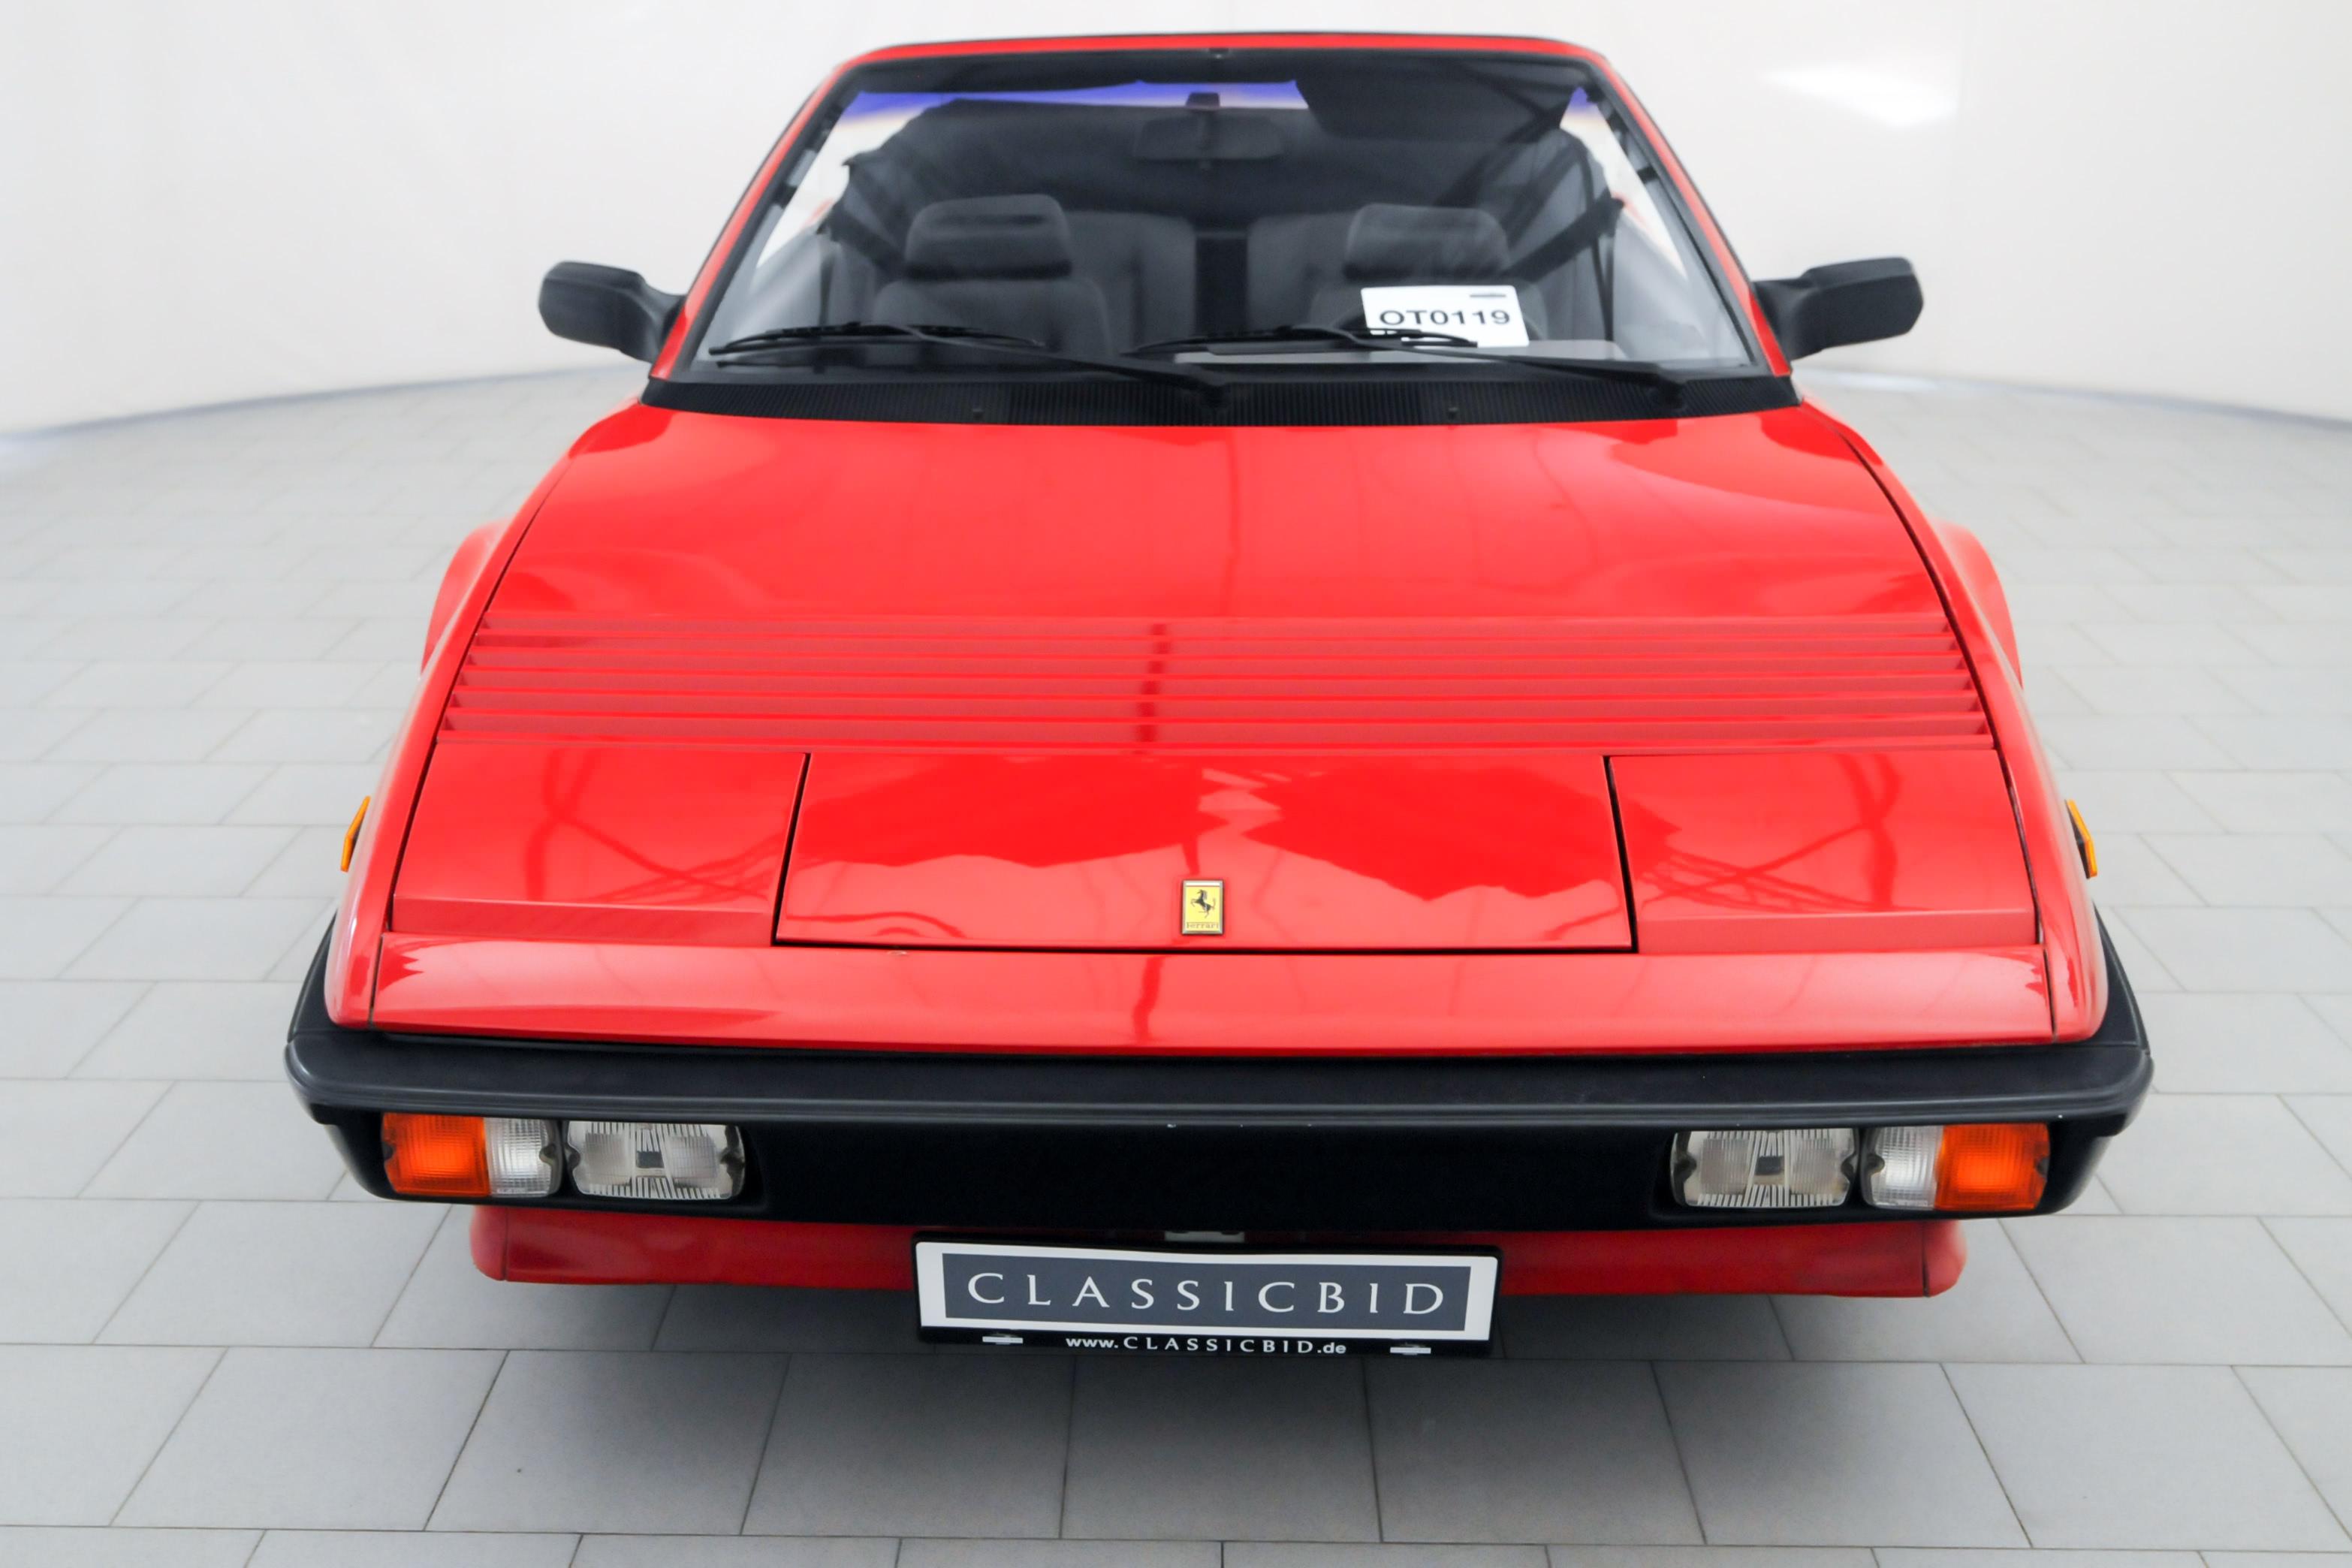 OT0119_05 Gorgeous Ferrari Mondial 3.2 Cabriolet V8 Quattrovalvole Cars Trend